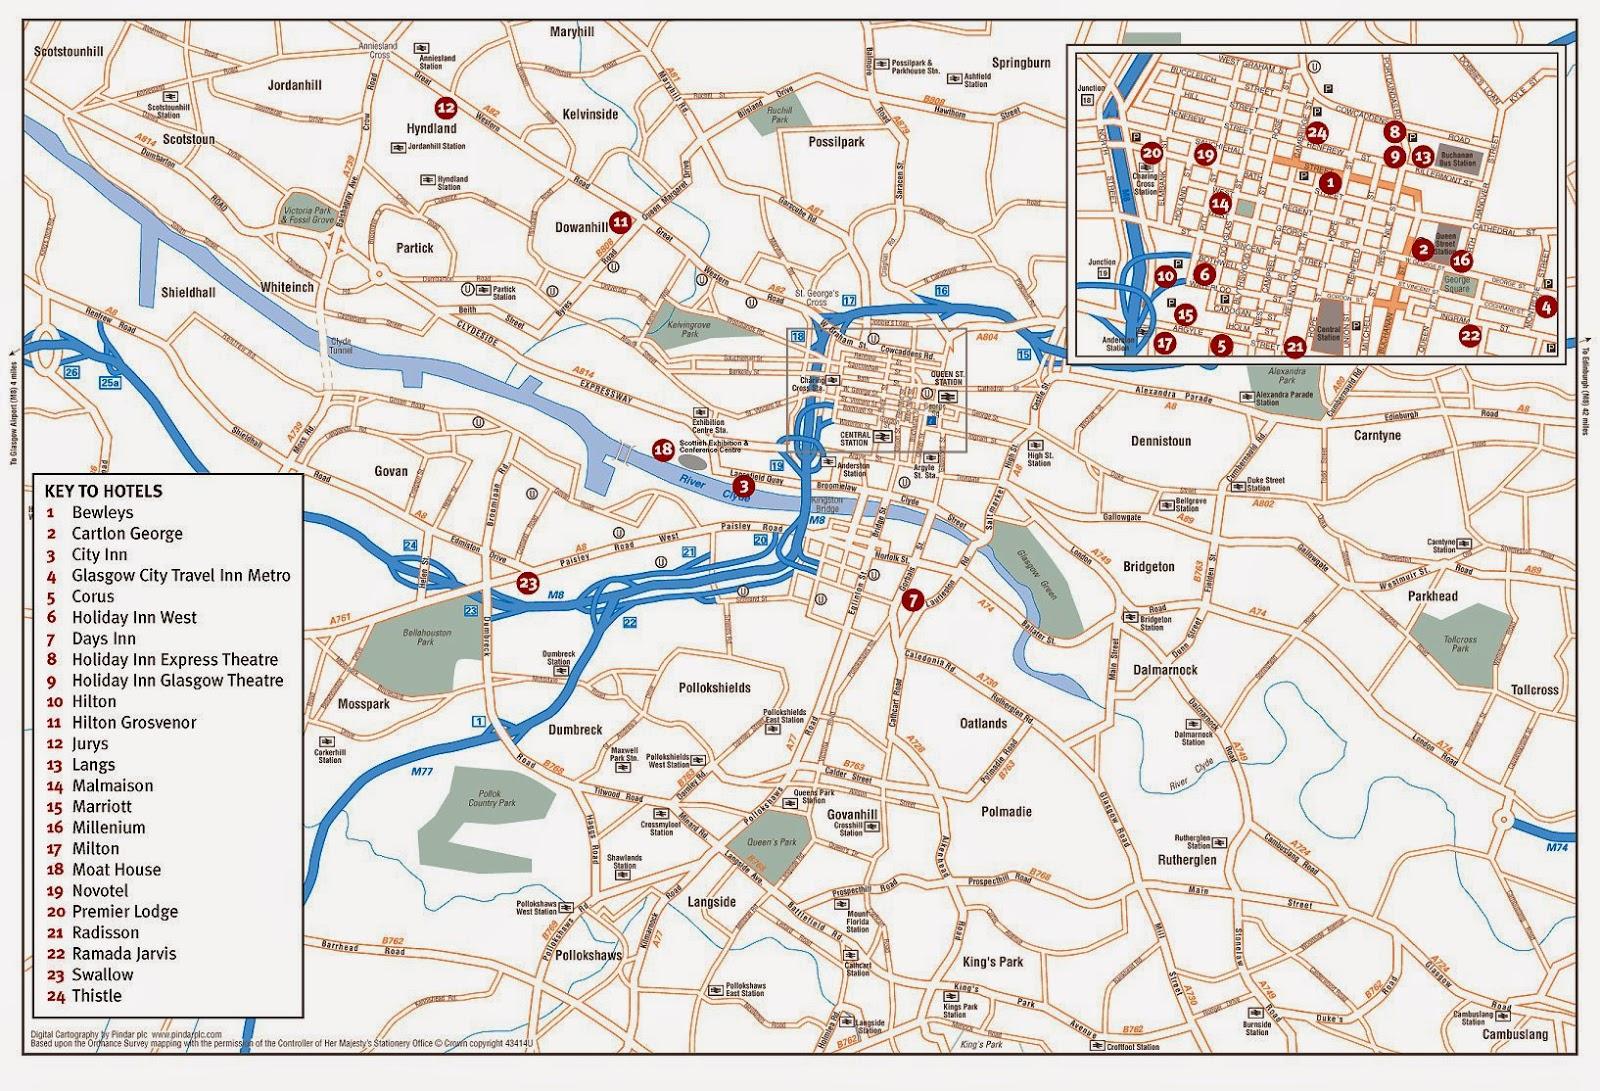 Map of Glasgow, Scotland - Free Printable Maps Glasgow Hotel Map on southend airports map, kiev map, paris map, zurich map, novosibirsk map, port antonio map, birmingham map, zelienople map, edinburgh map, marseille france map, dublin map, red road map, europe map, united kingdom map, ferrum map, loch ness map, wales map, fort thomas map, scotland map, prague map,